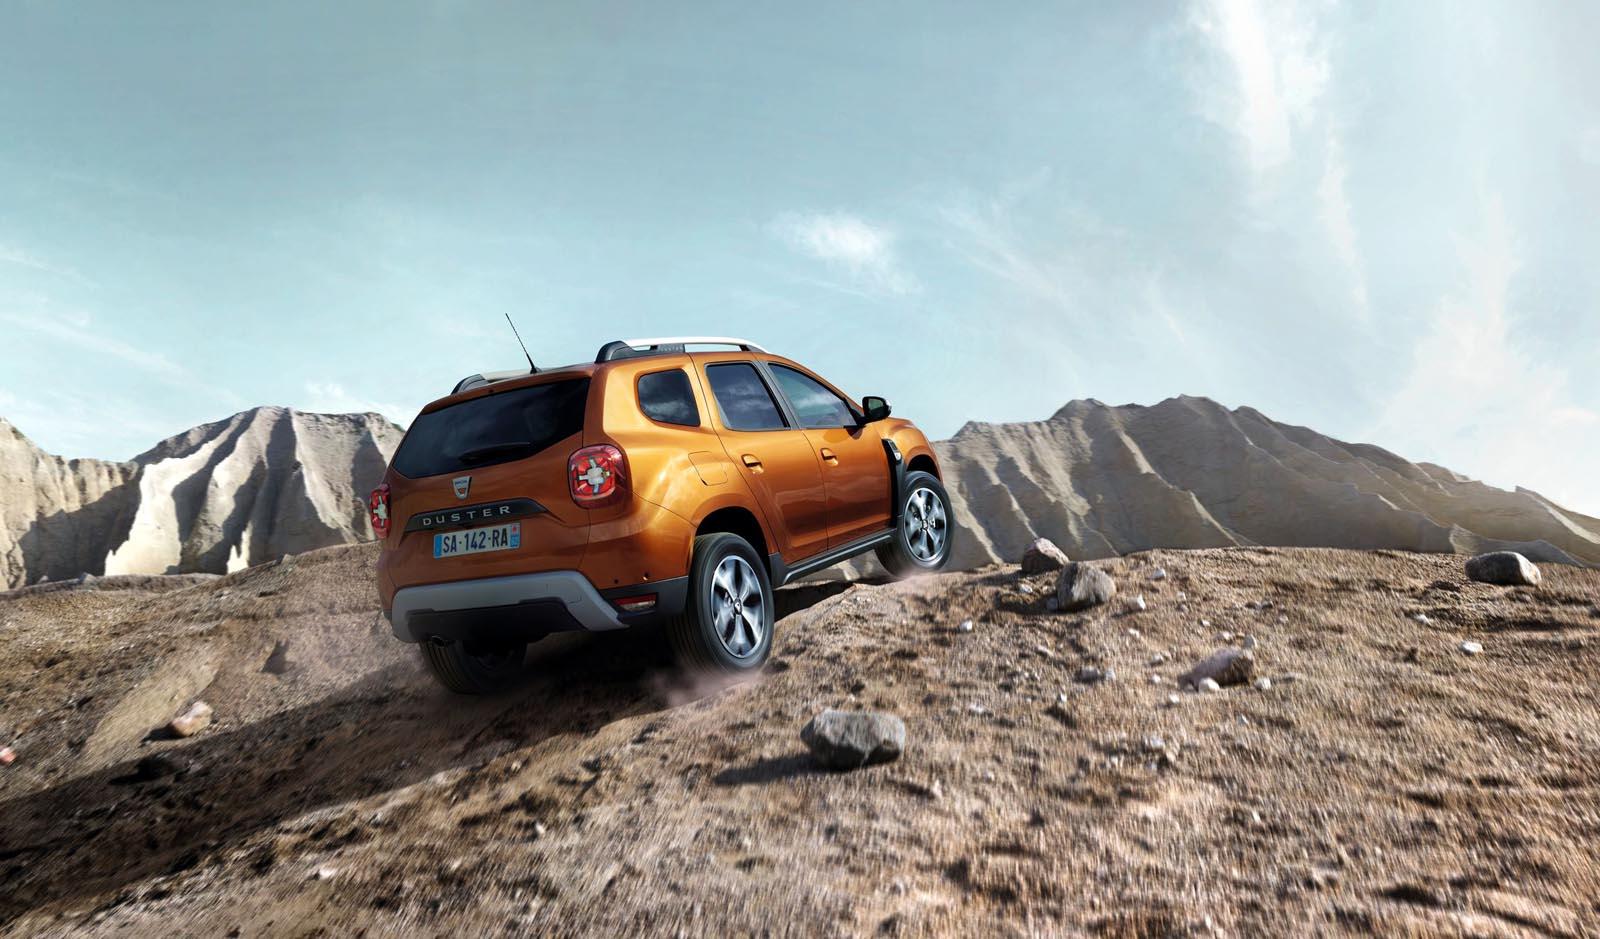 Photo of Μέχρι το 2022 όλα τα Dacia θα έχουν εξηλεκτρισμένες εκδόσεις